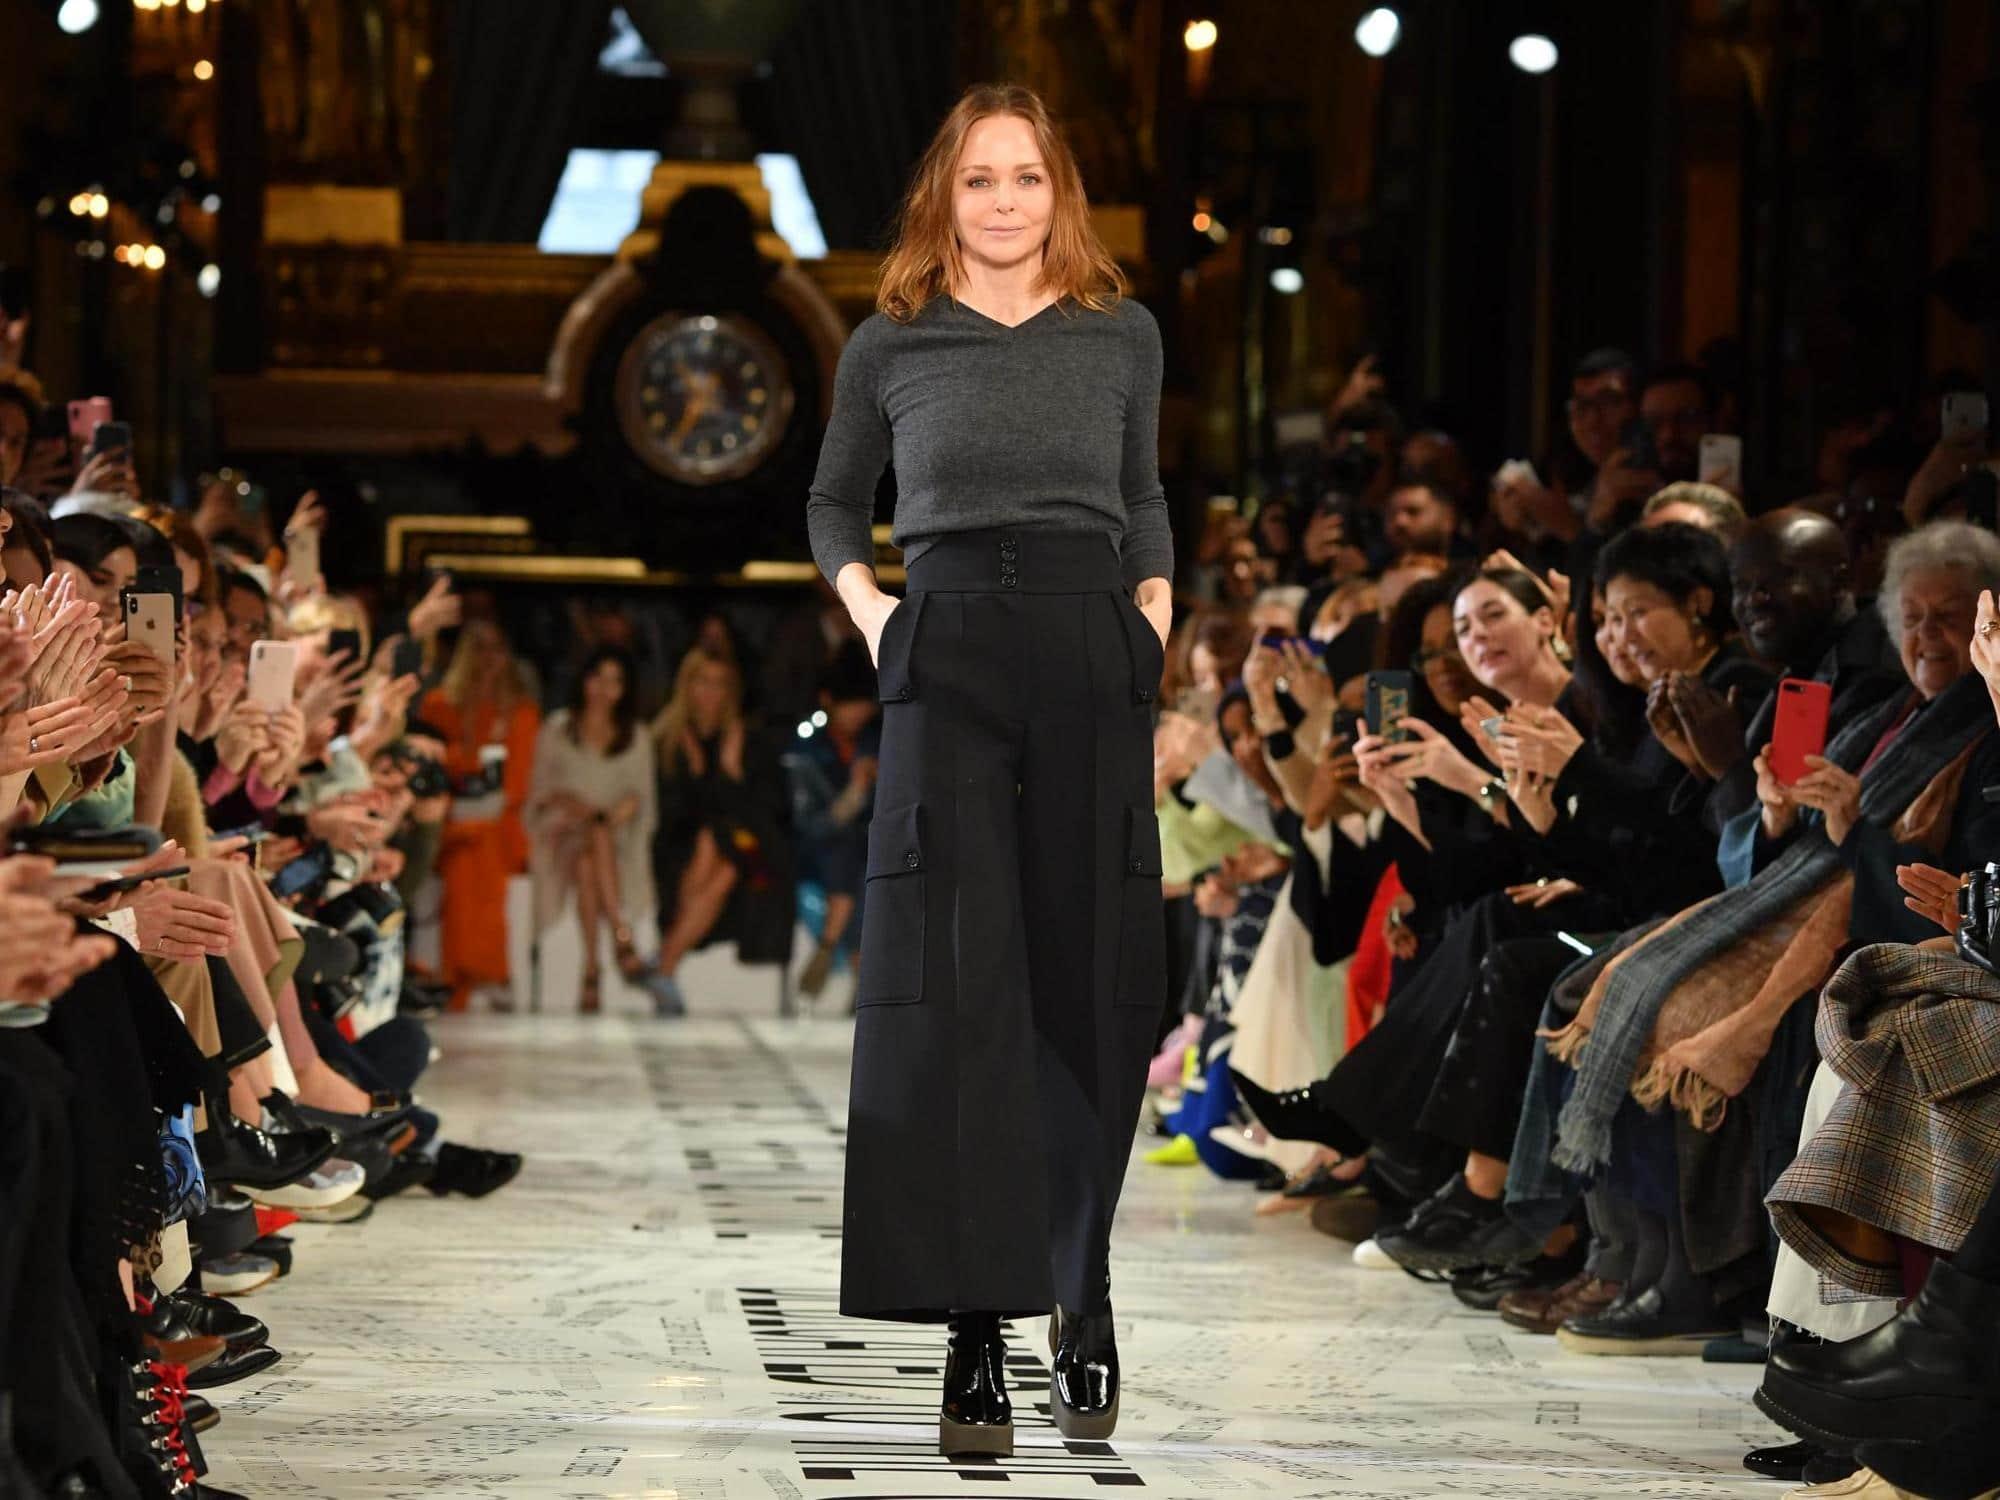 Stella Mccartney appoints Gabriele Maggio as CEO - Luxus Plus